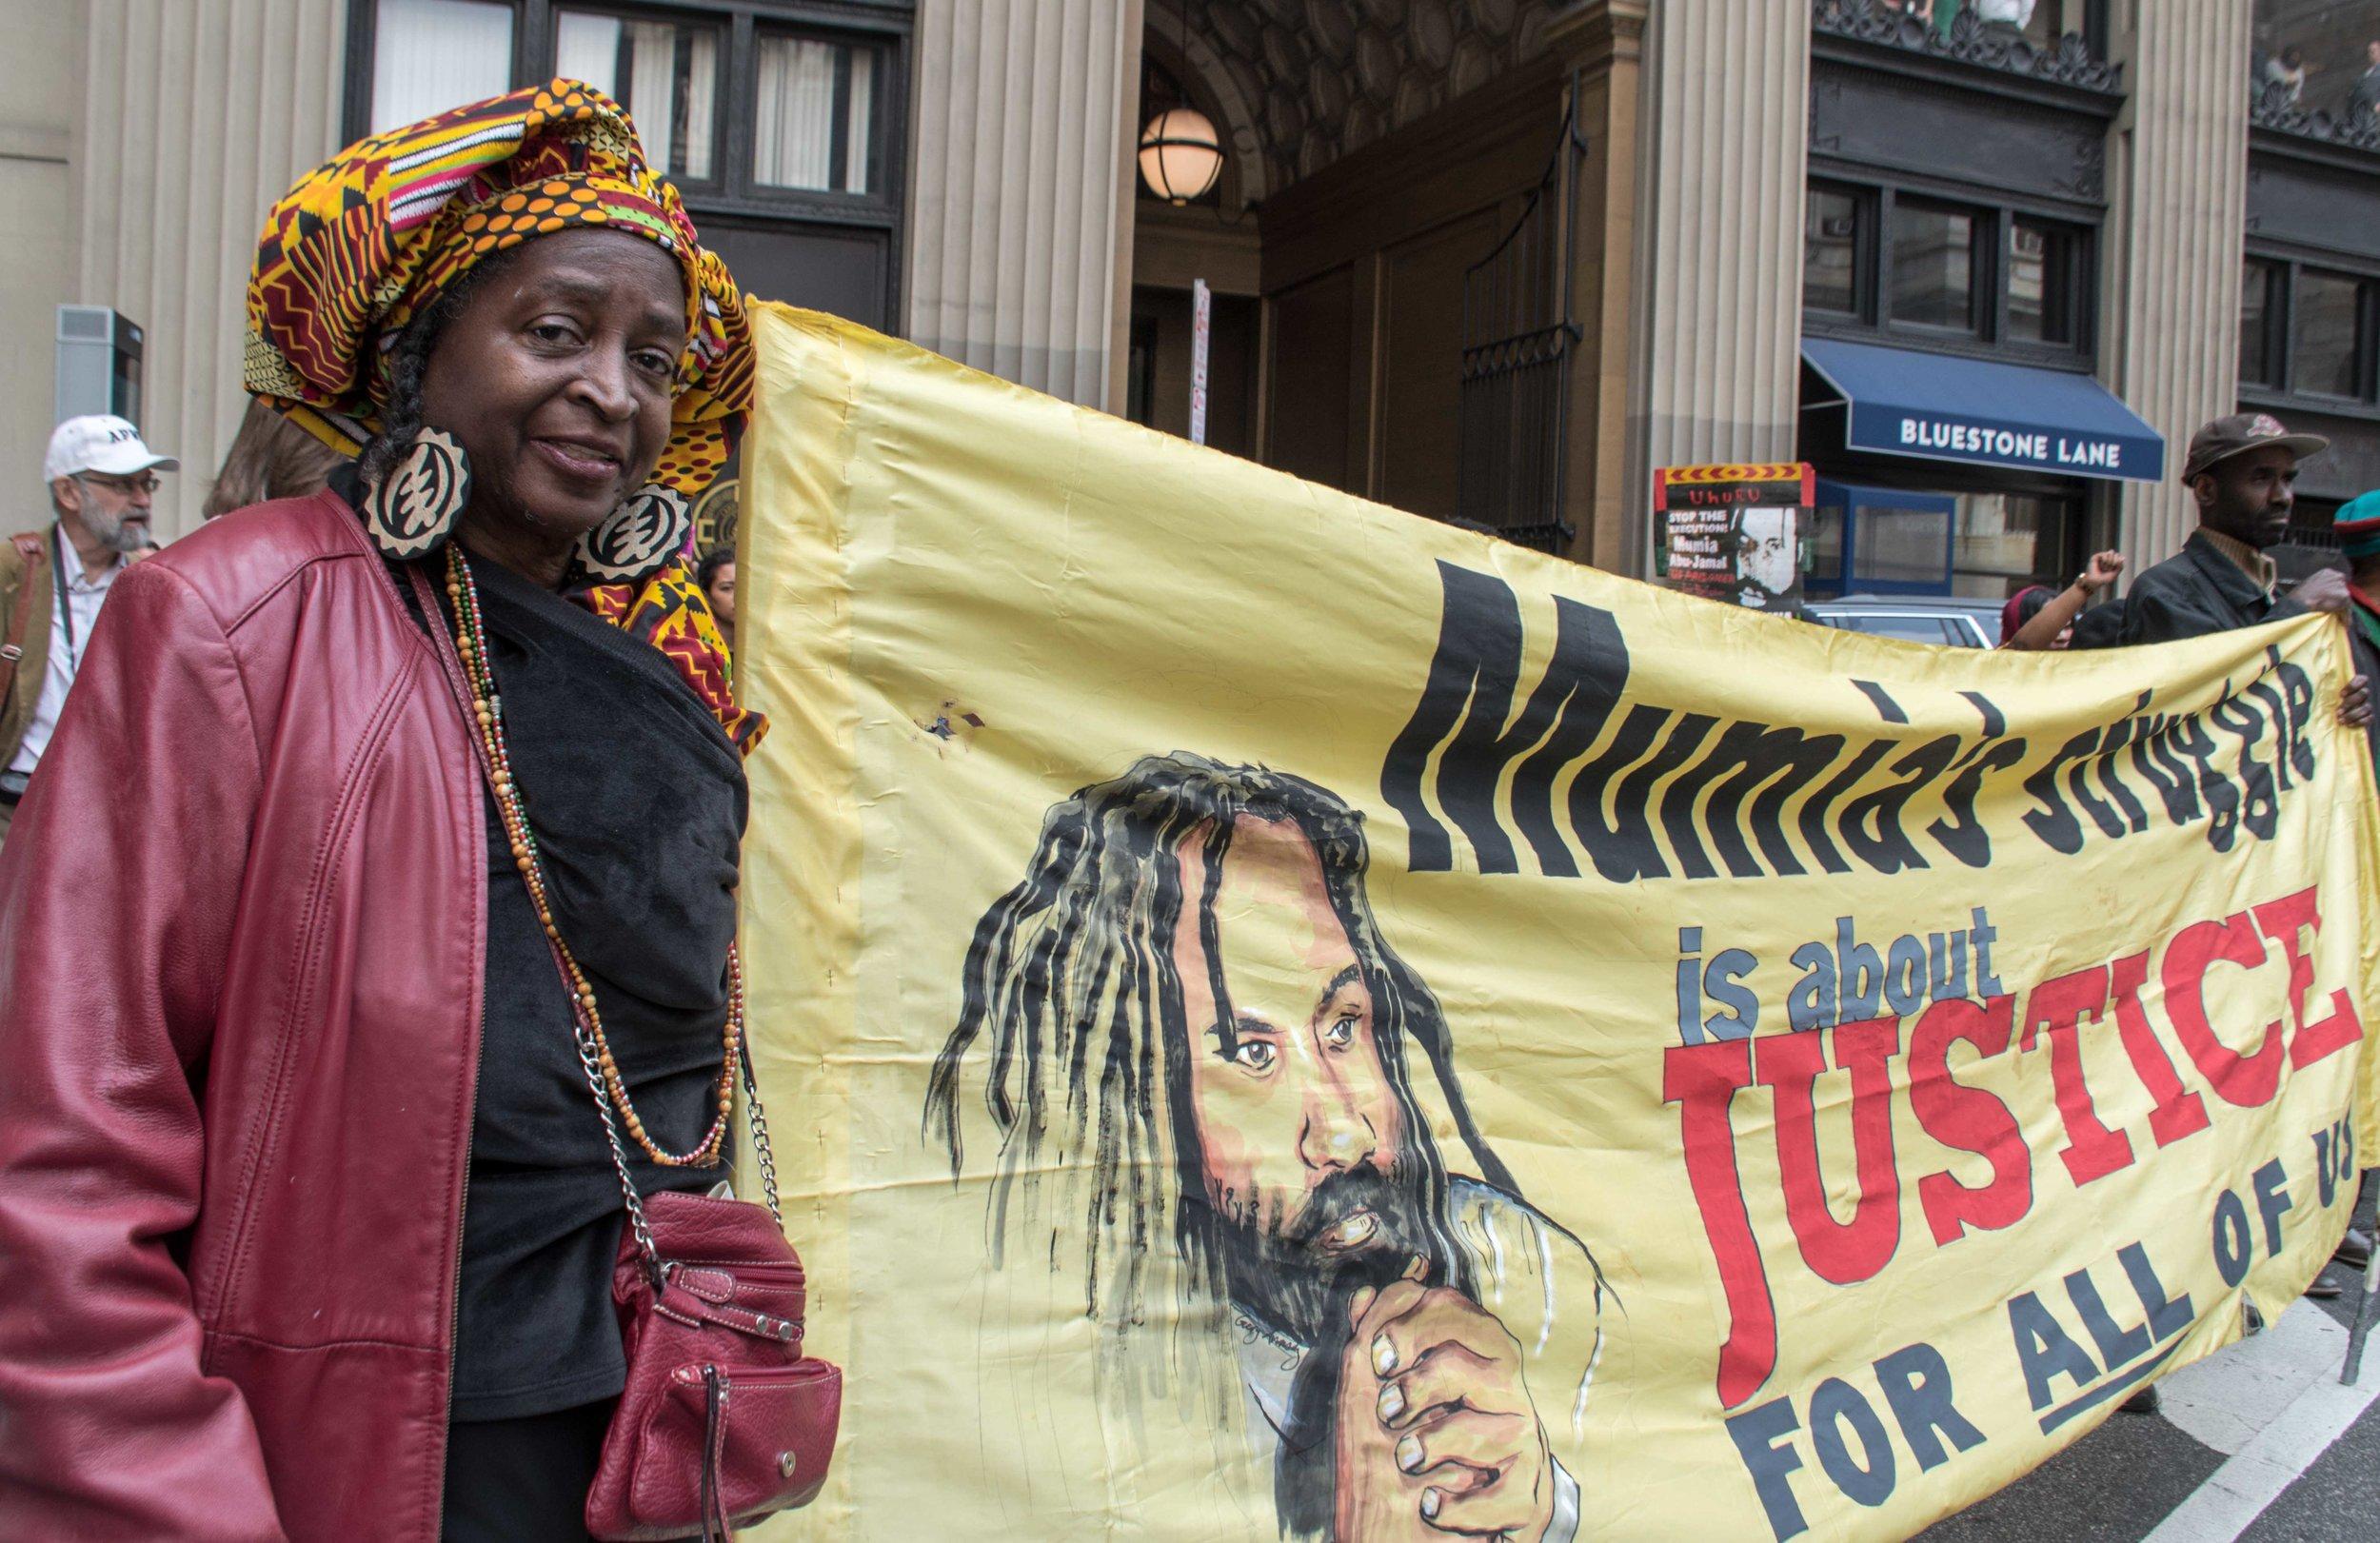 Philadelphia, Apr 18, 2019 - Press Conference for Mumia Abu-Jamal. Nana Njinga with banner. (photo credit: Joe Piette)